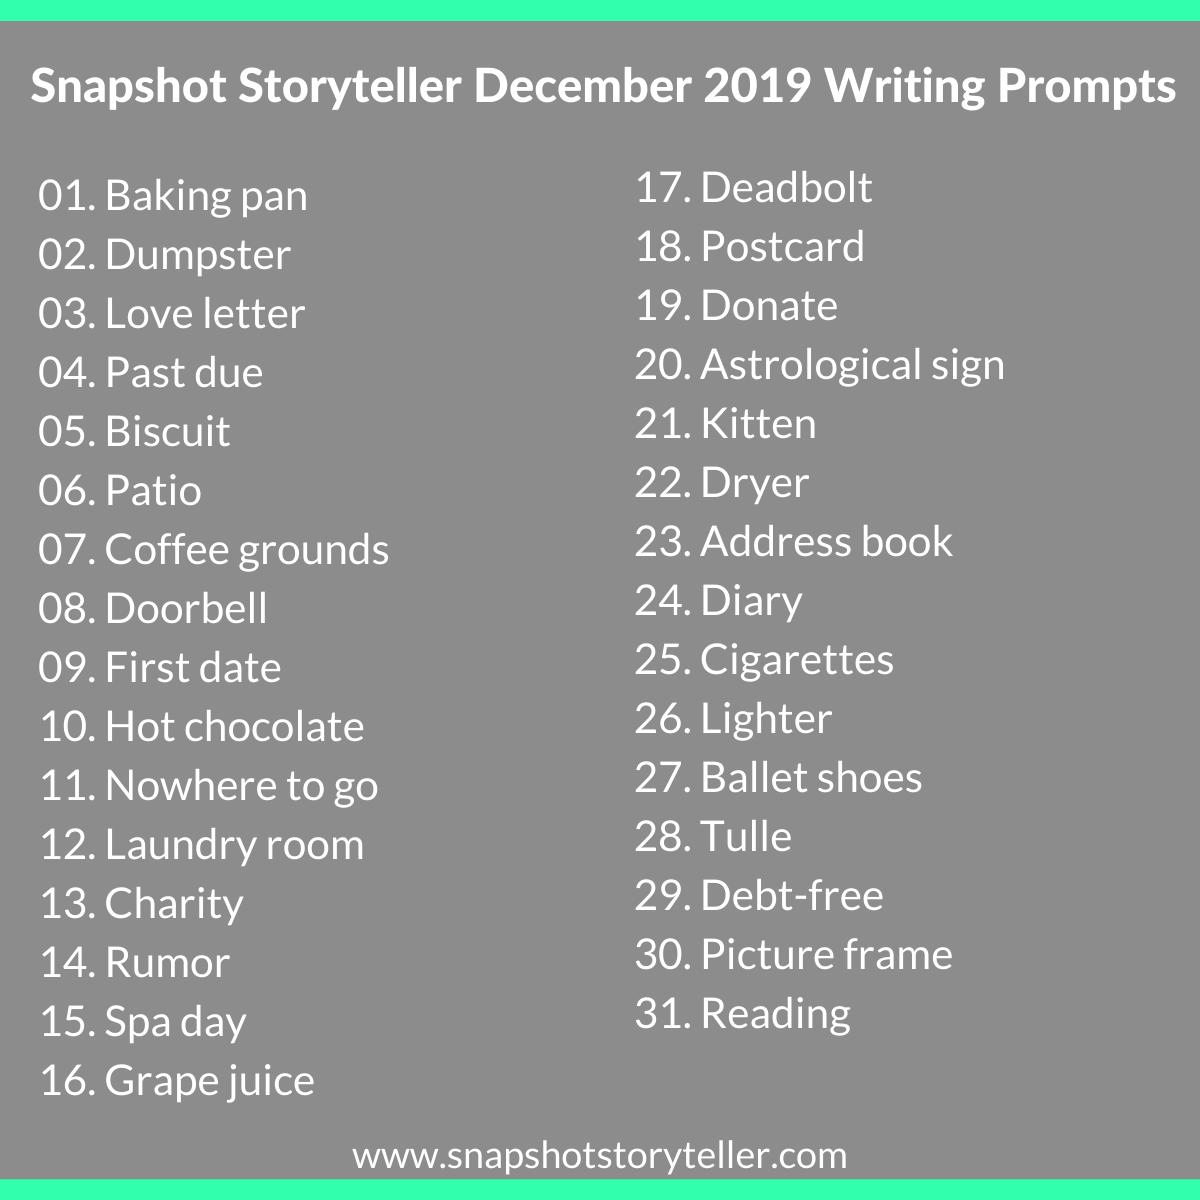 Snapshot Storyteller | December 2019 Writing Prompts | www.snapshotstoryteller.com #amwriting #SnapshotStoryteller #creativestoryteller #creative #storyteller #creativewriter #IWrite #WriteOn #writersofinstagram#writingprompt #writingprompts